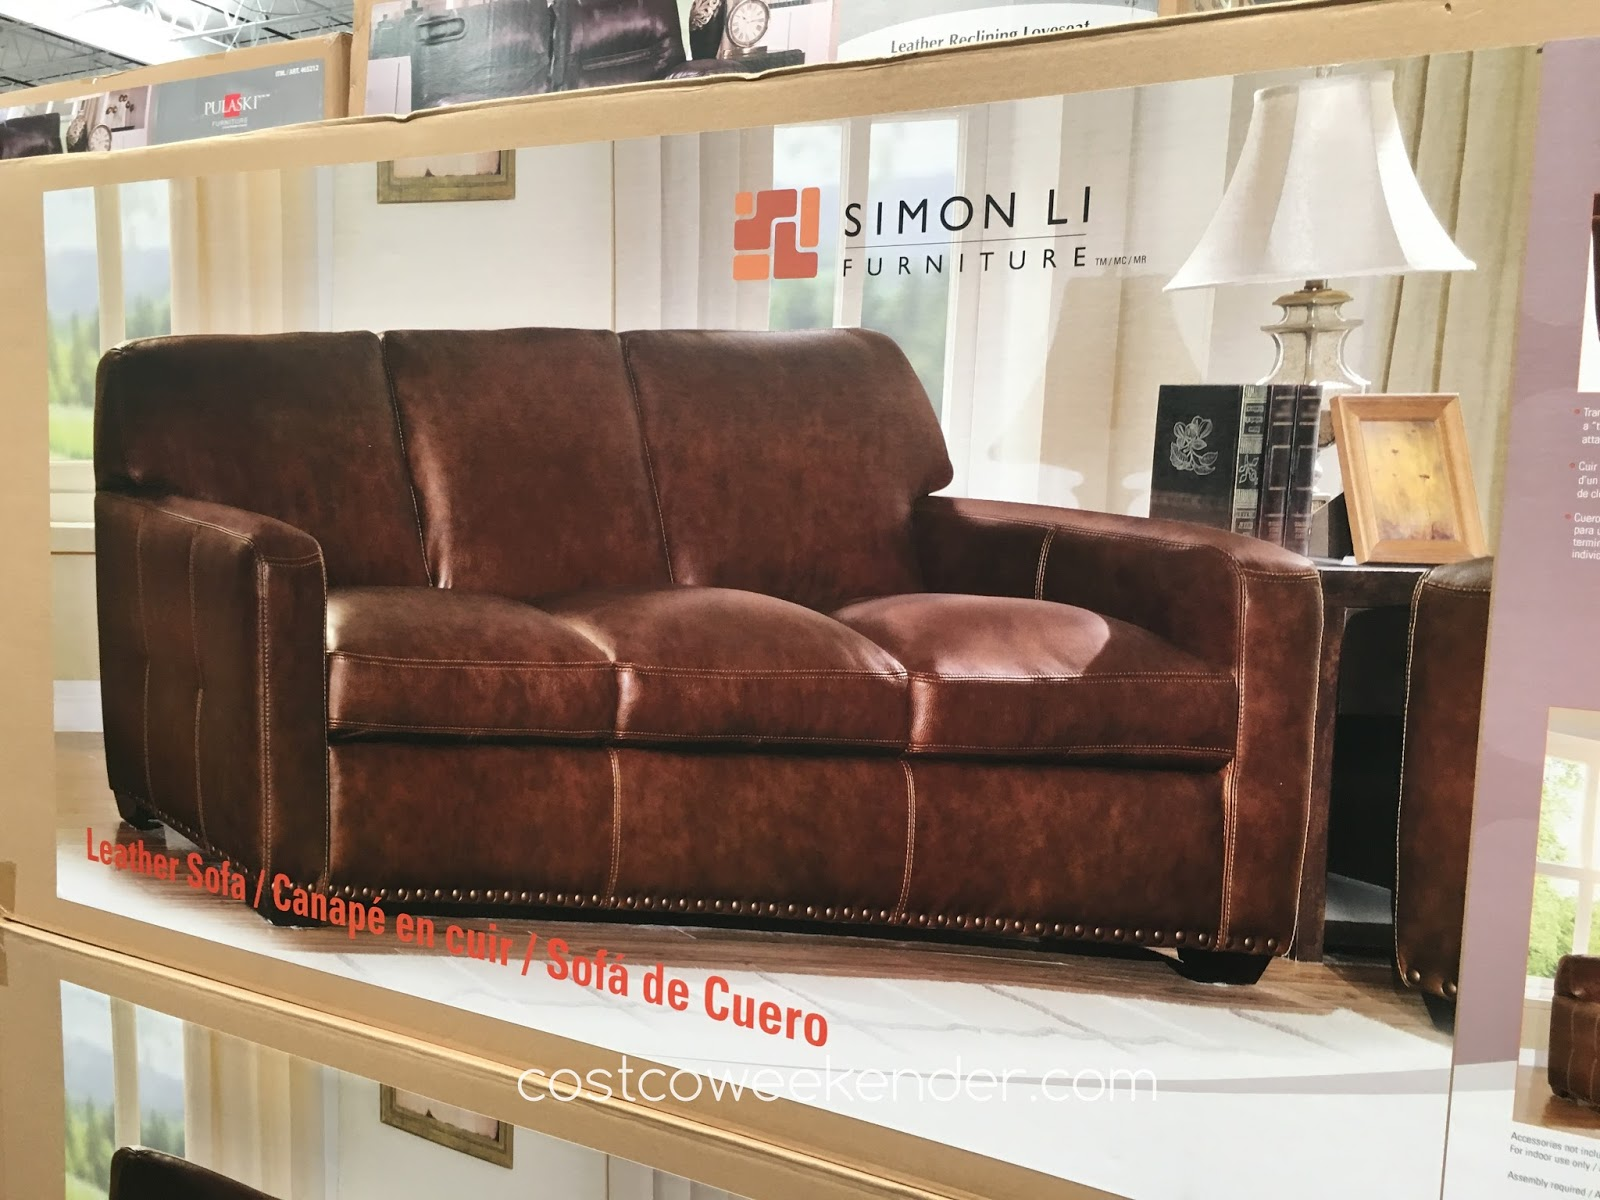 Costco 734867 Simon Li Leather Sofa The Timeless Look Of A Track Arm Design